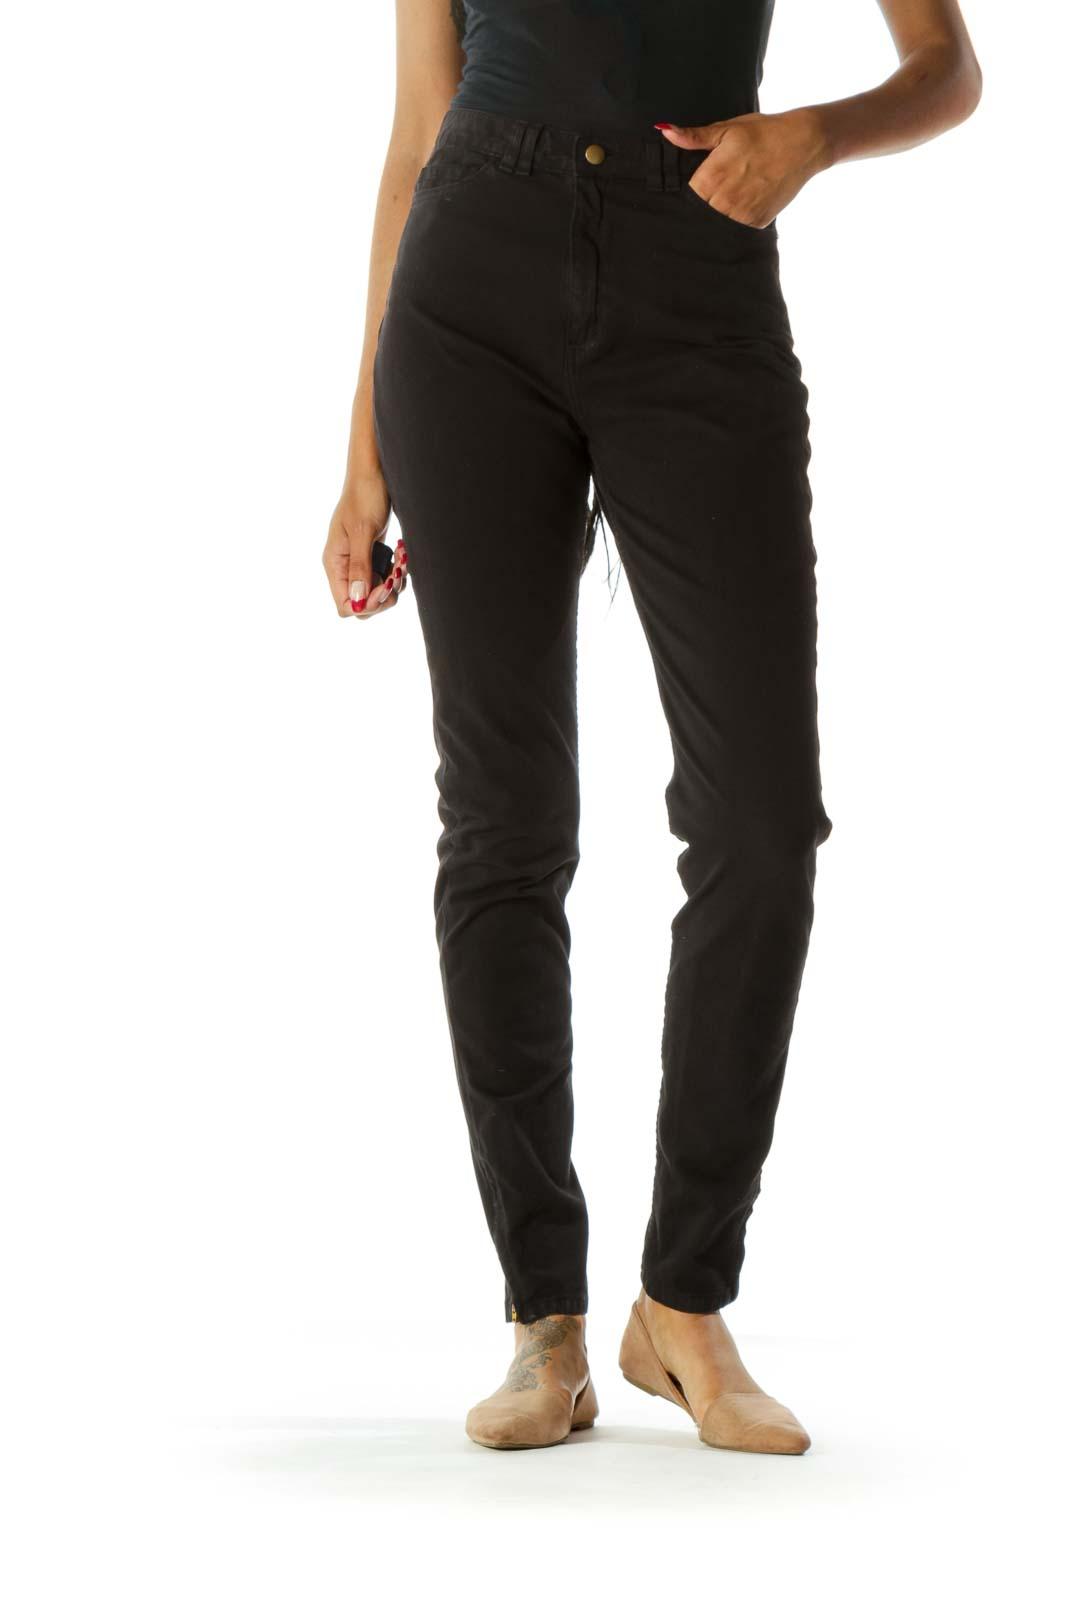 Black High-Waisted Denim Jeans